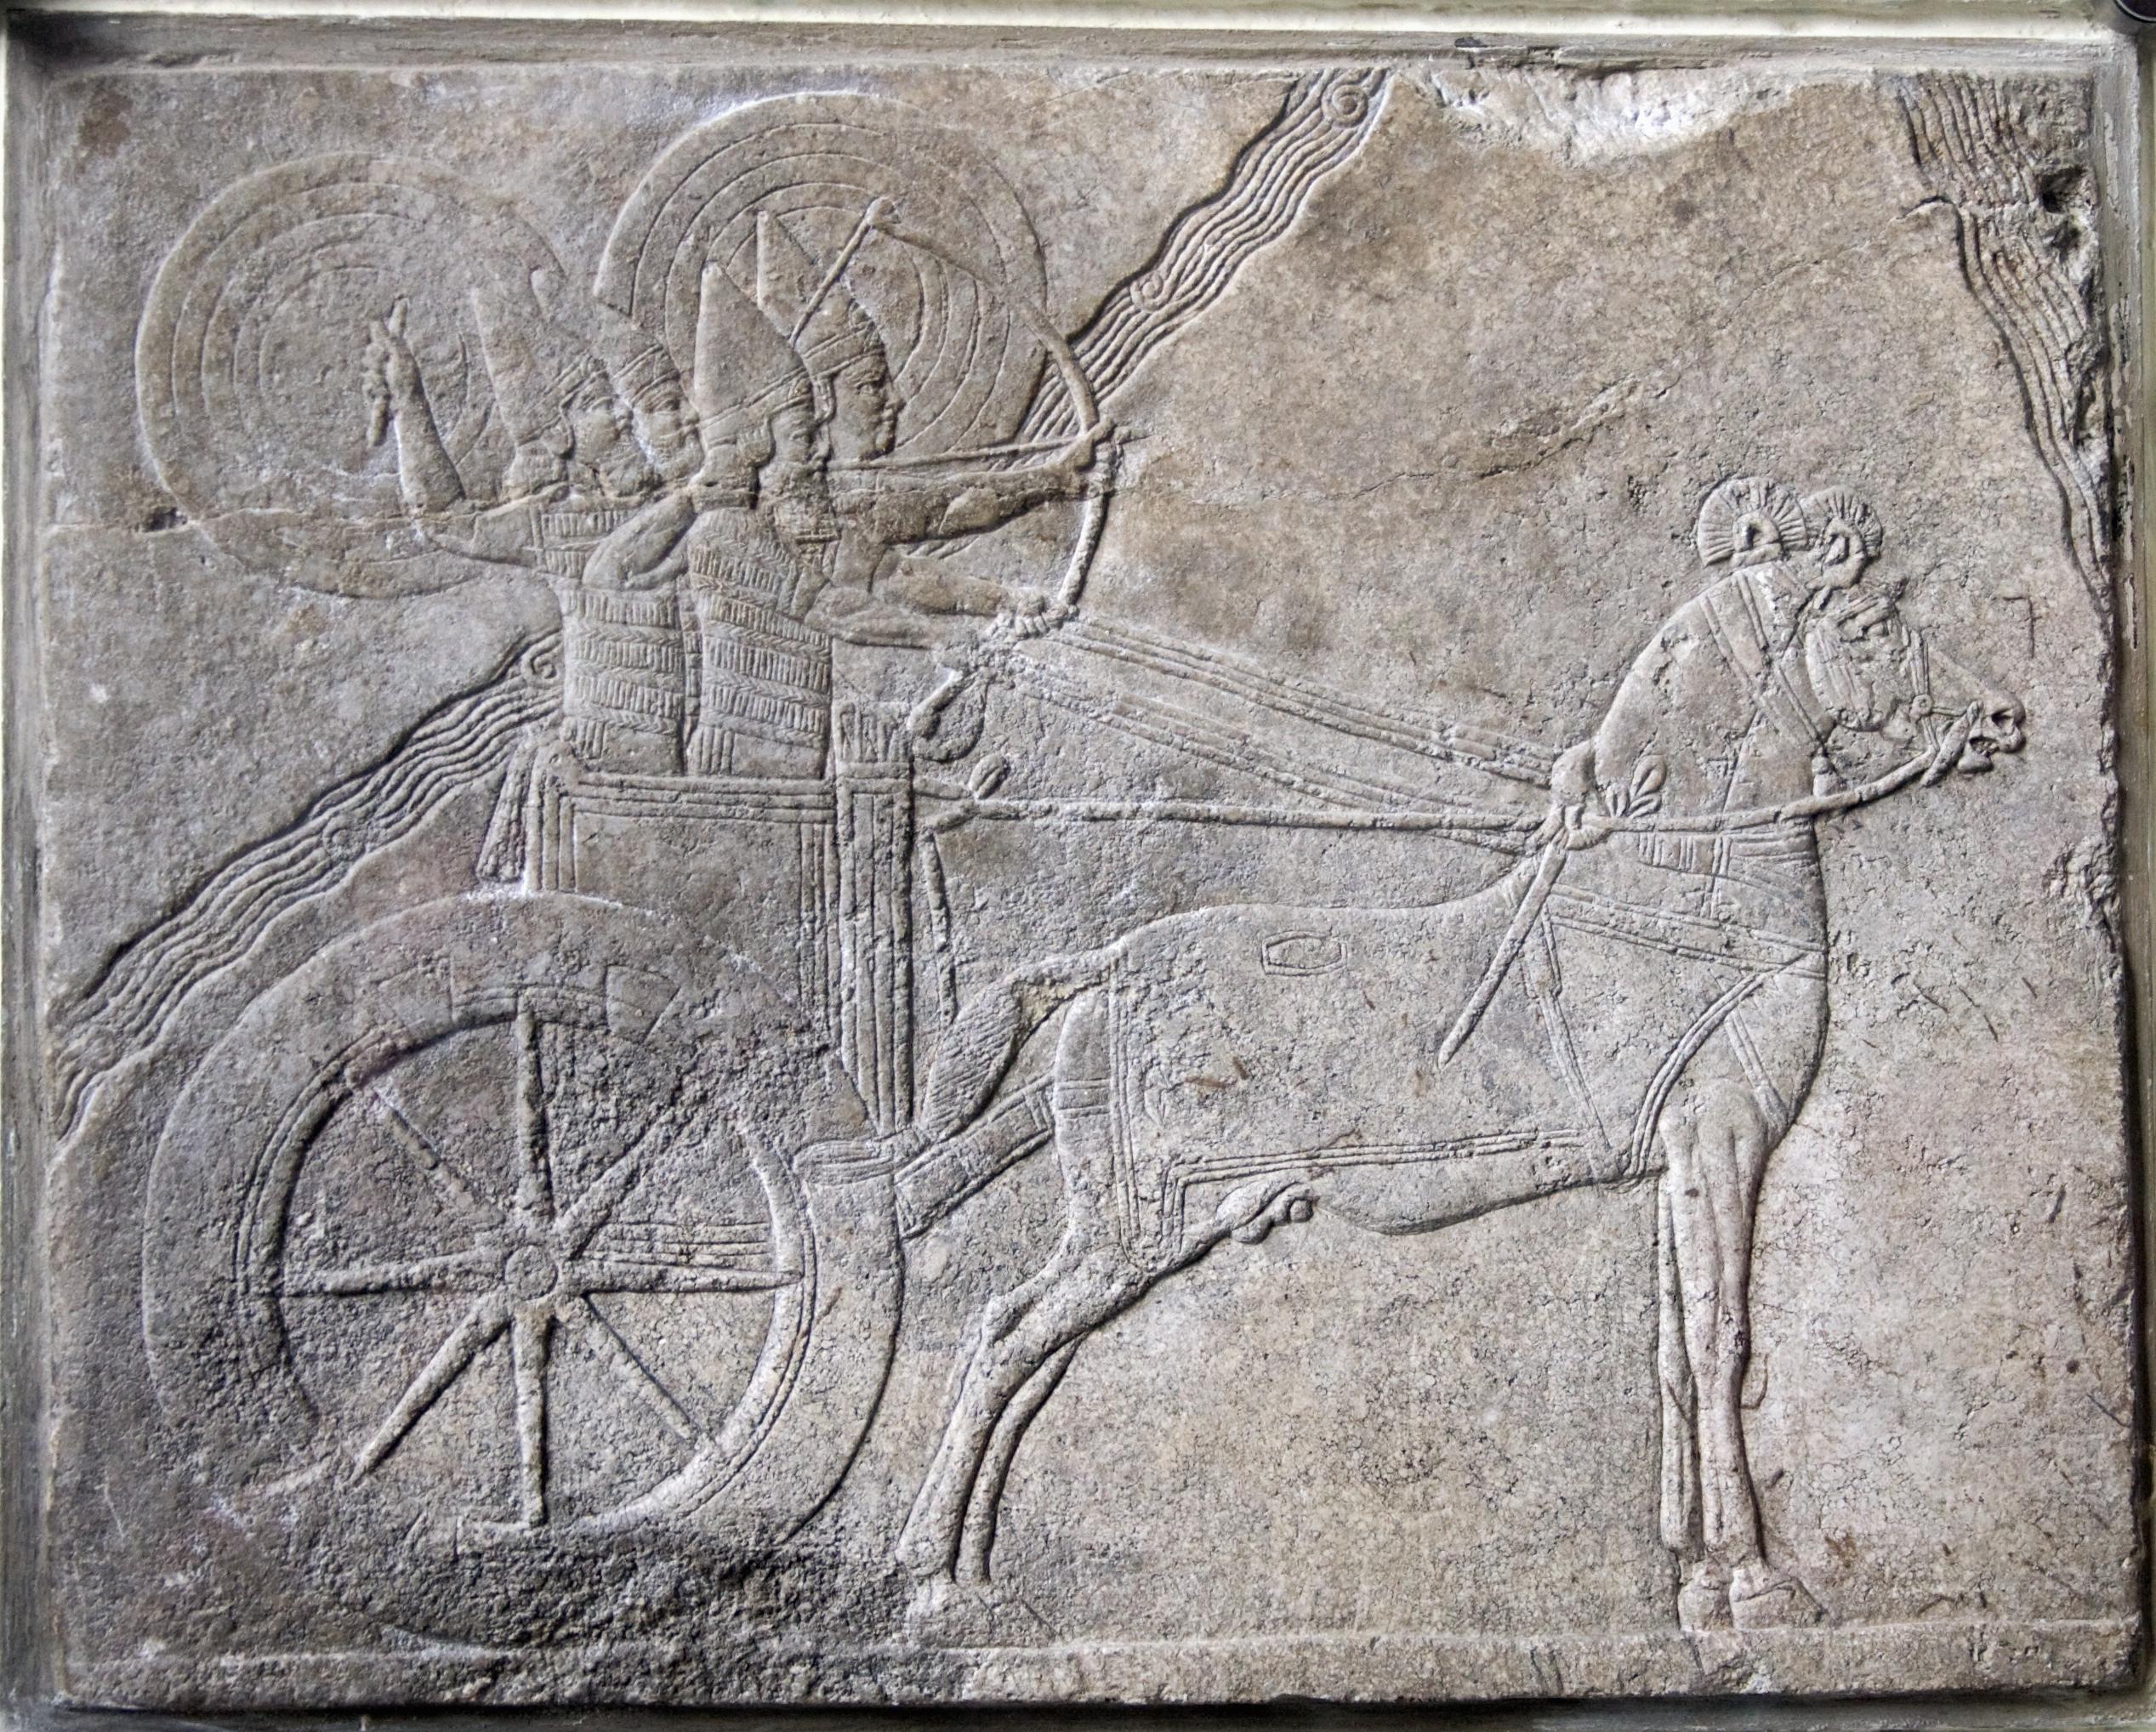 https://upload.wikimedia.org/wikipedia/commons/4/4e/Ninevehreliefashurbanipalagainsthamanu.jpg